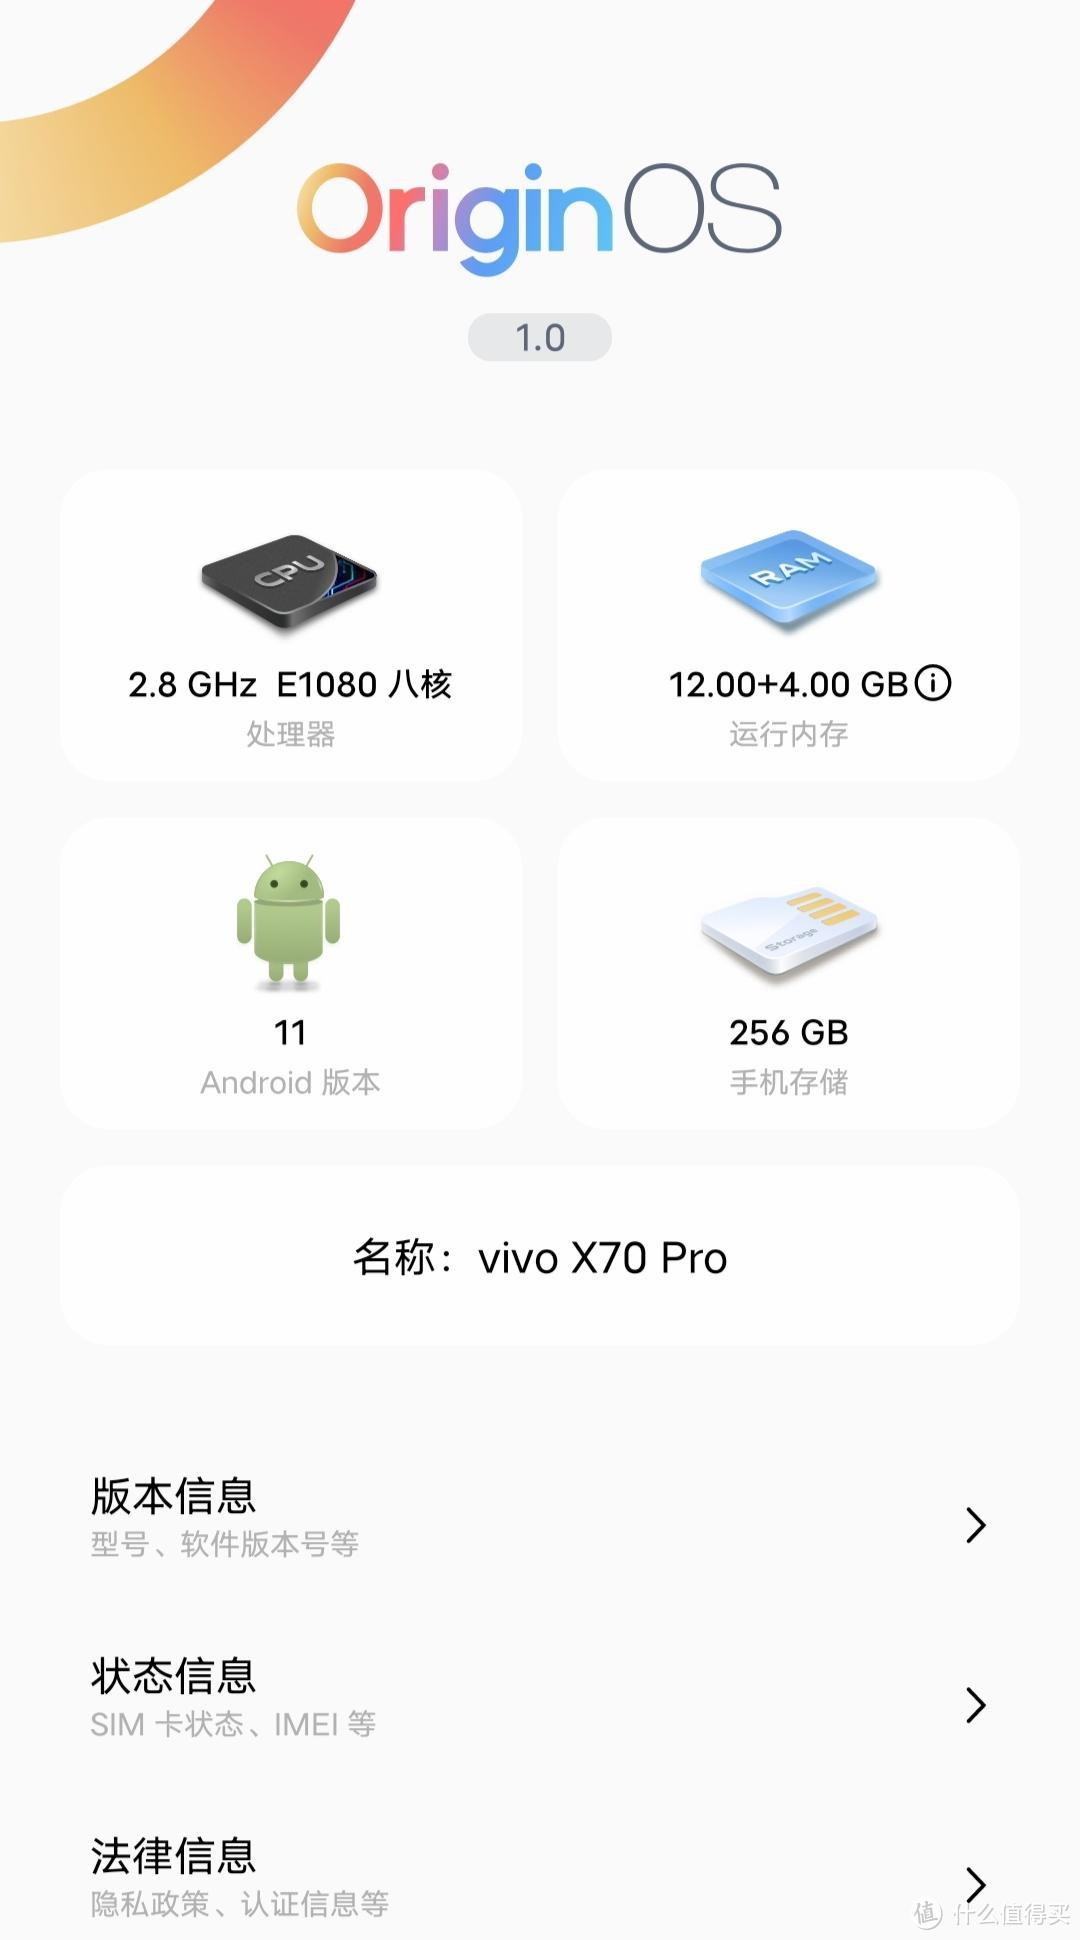 vivo首款独立影像芯片,打造极致手机摄影新旗舰:X70 Pro上手简评